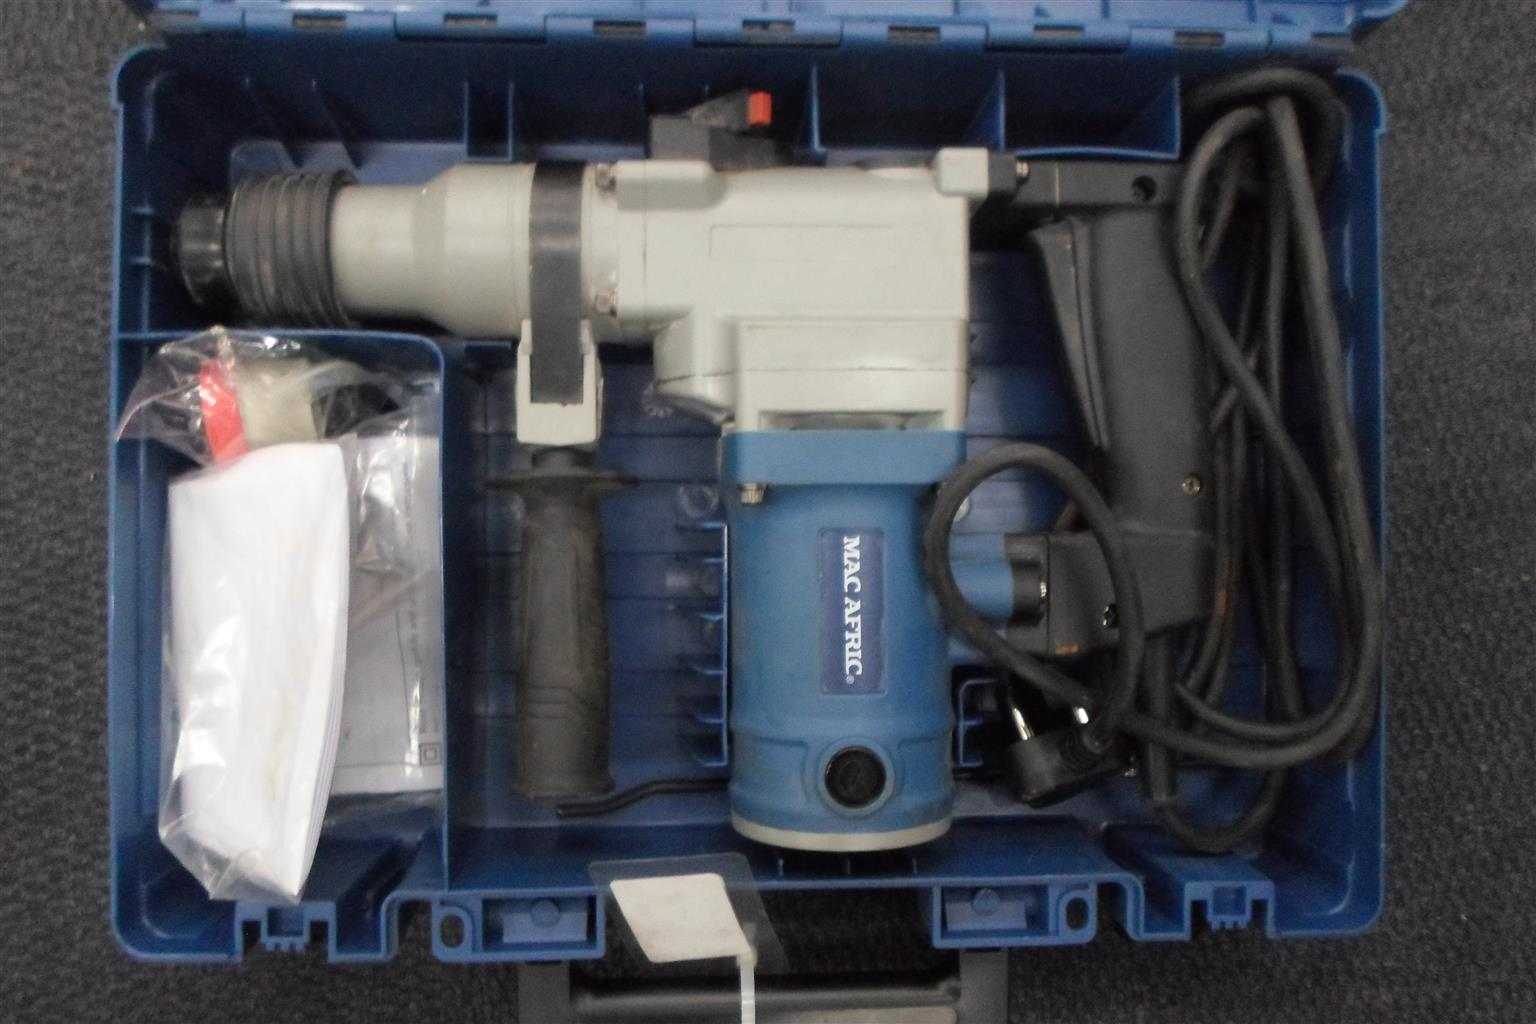 960W Mac Afric SDRILR-030 Drill